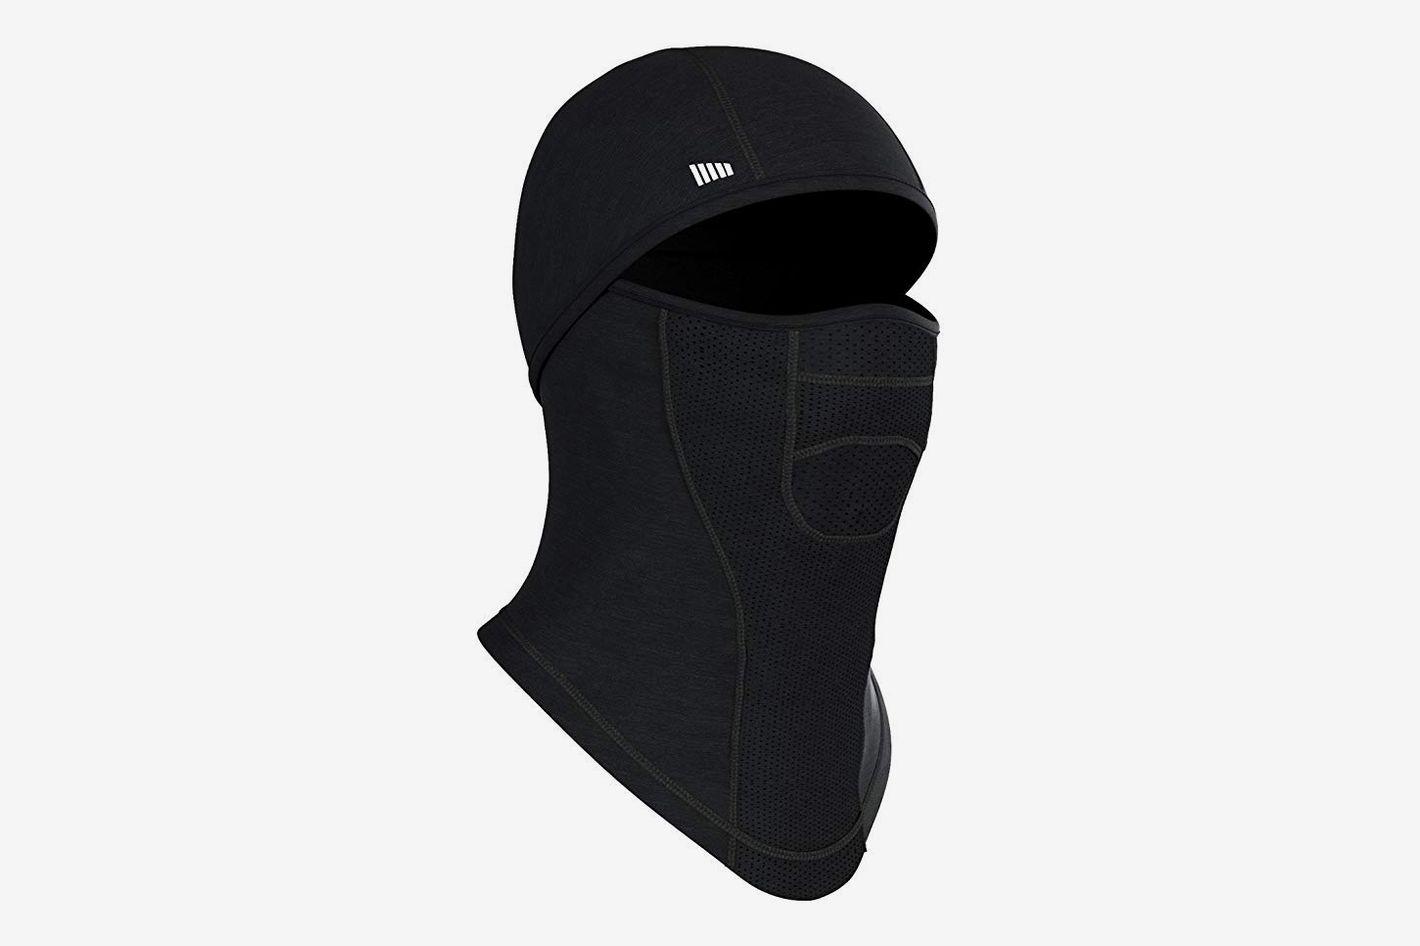 91c06cca2d6 Self Pro Balaclava - Windproof Ski Mask - Cold Weather Face Motorcycle Mask  at Amazon